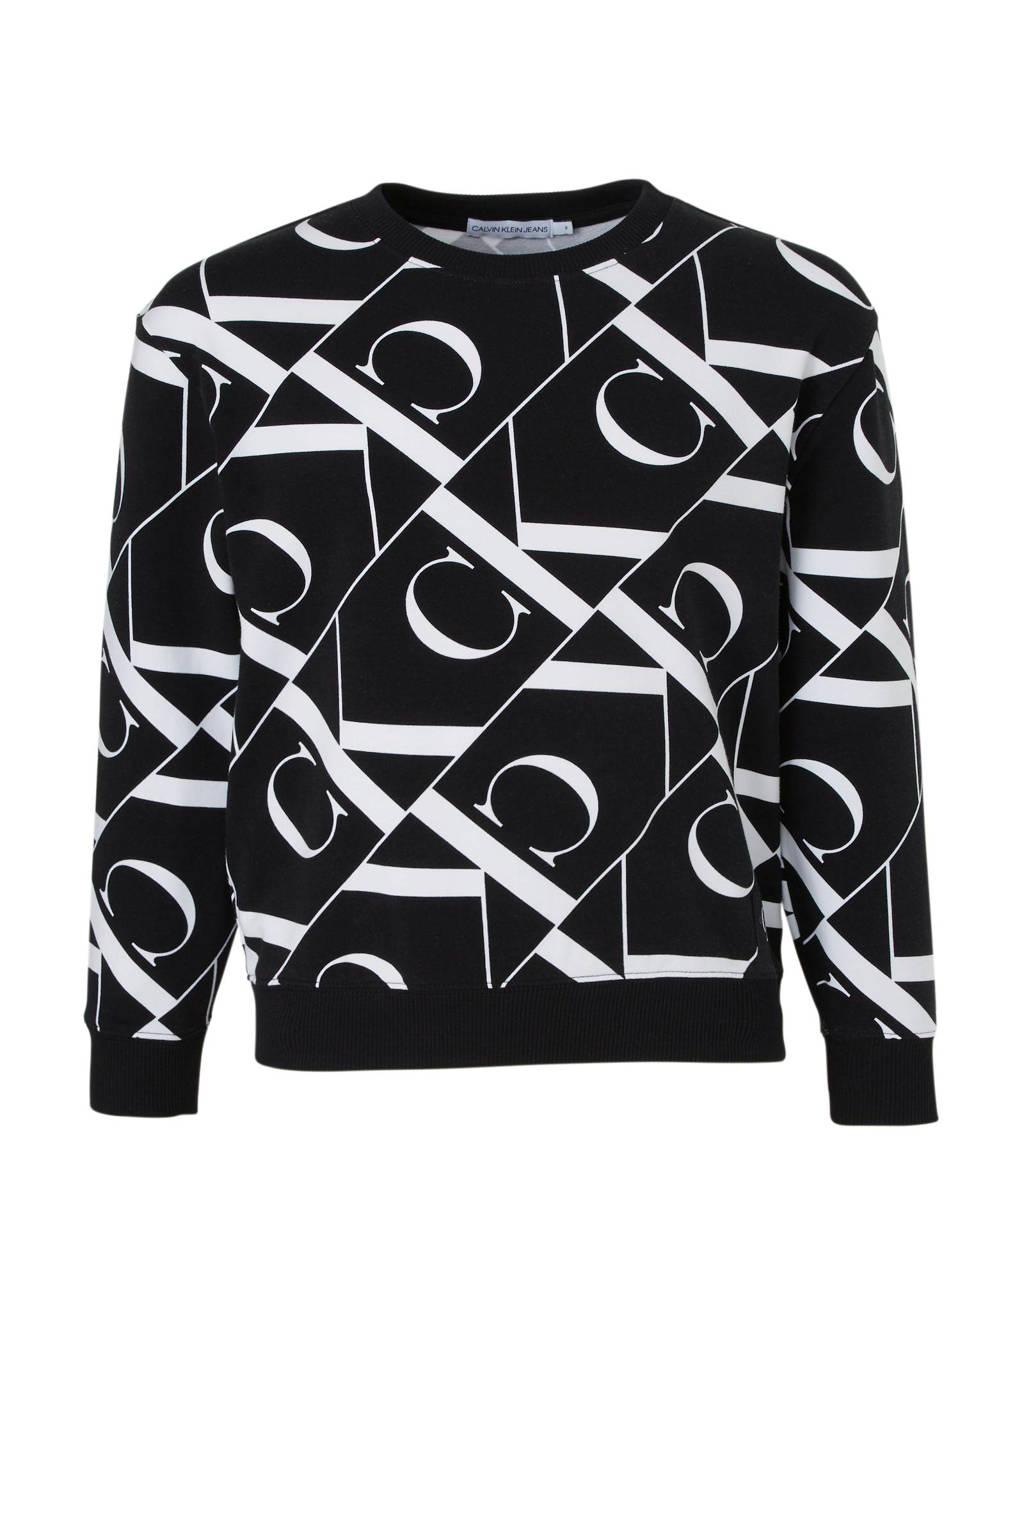 CALVIN KLEIN JEANS sweater met all over print zwart/wit, Zwart/wit